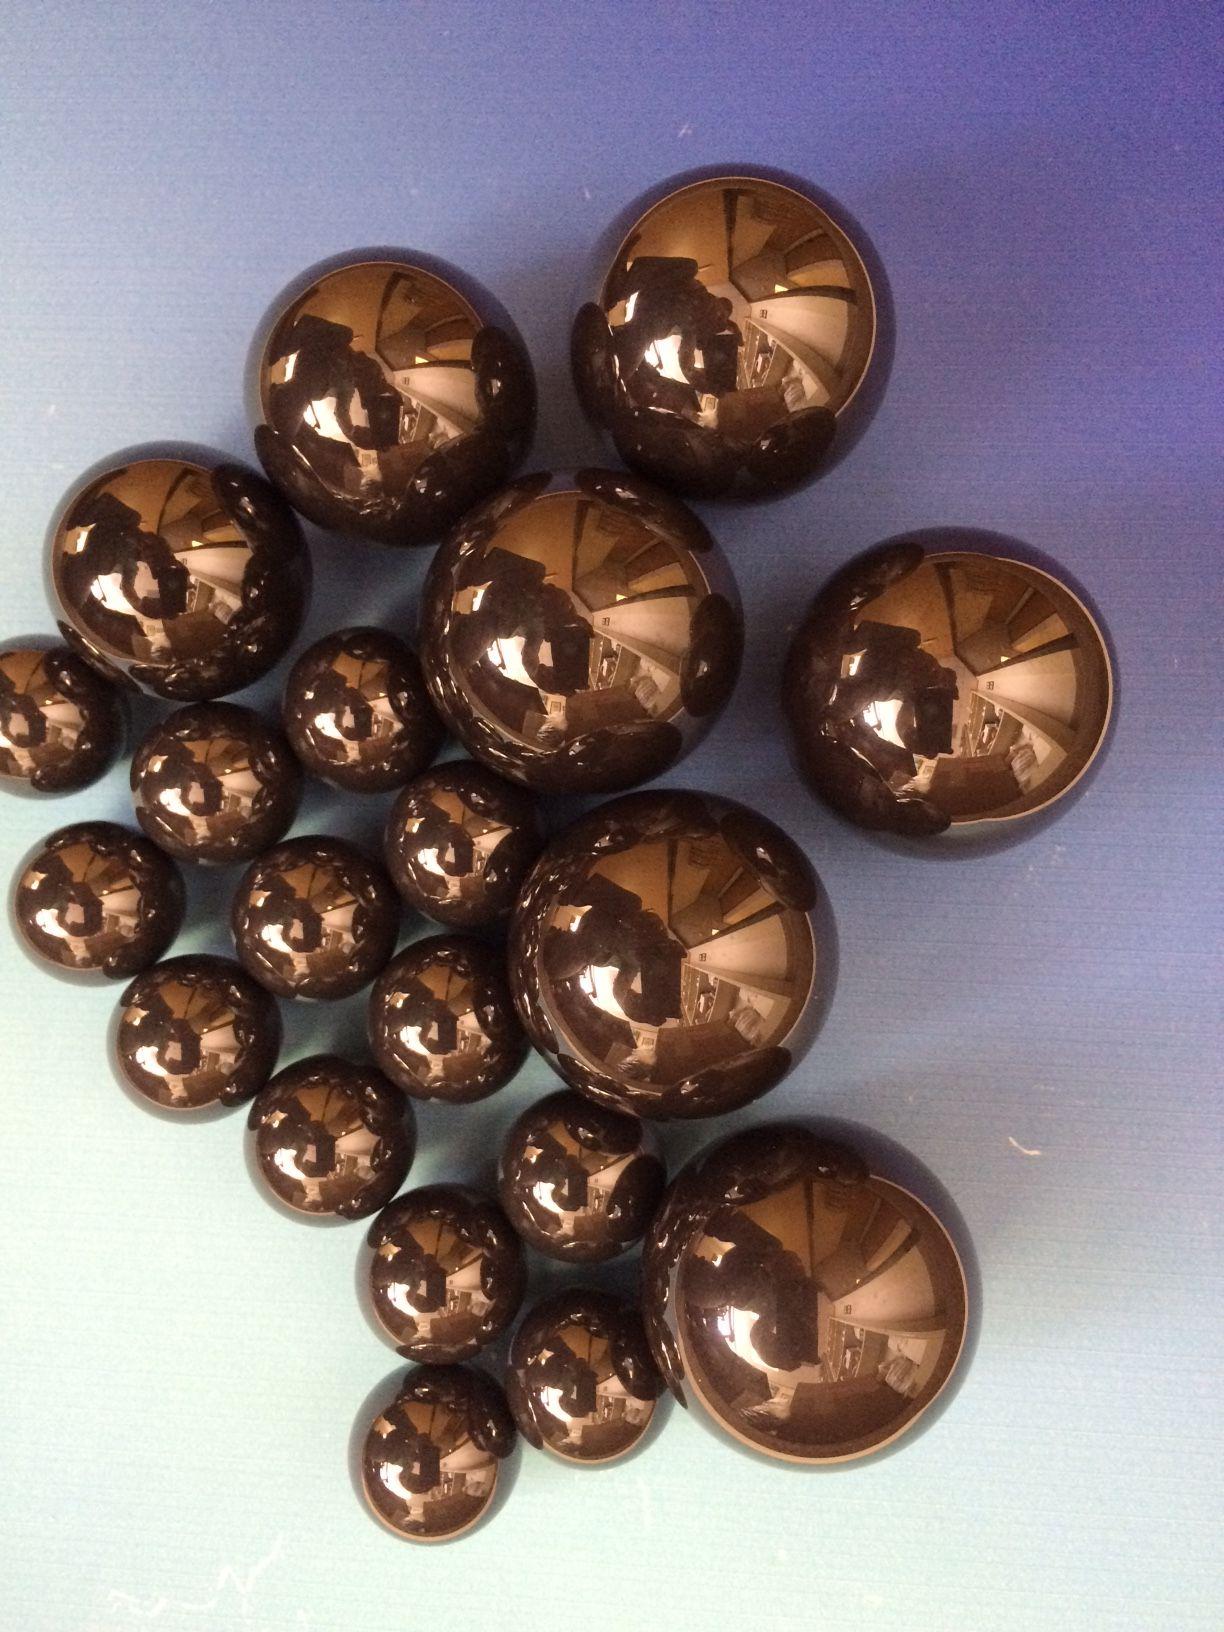 Ceramic Technologies High Precision Silicon Nitride Sucker Rod Balls Offer Long Lasting Performance Combined With Advanced Ceramics Ceramics Ceramic Materials